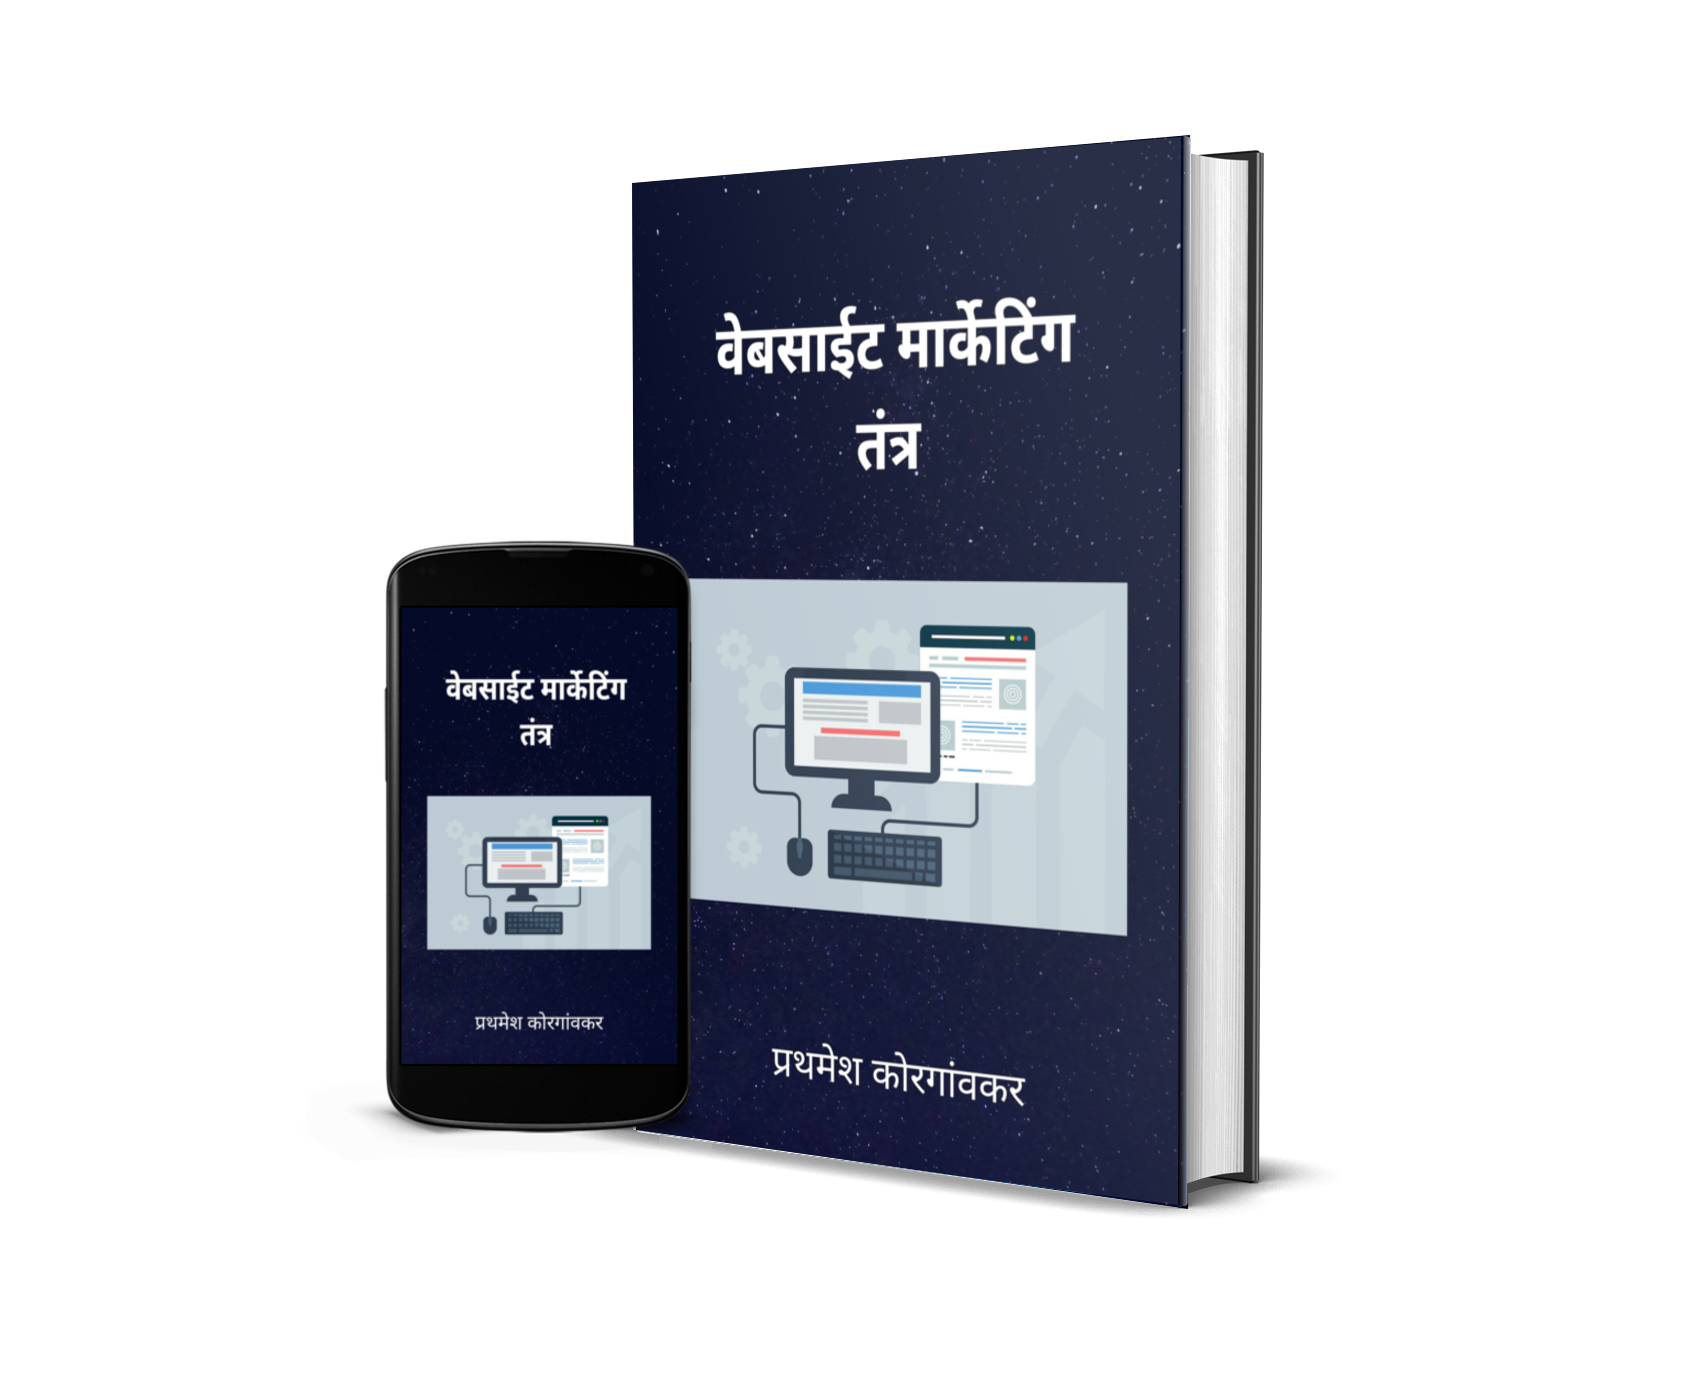 PDF Ebook : इंटरनेट मार्केटिंग तंत्र